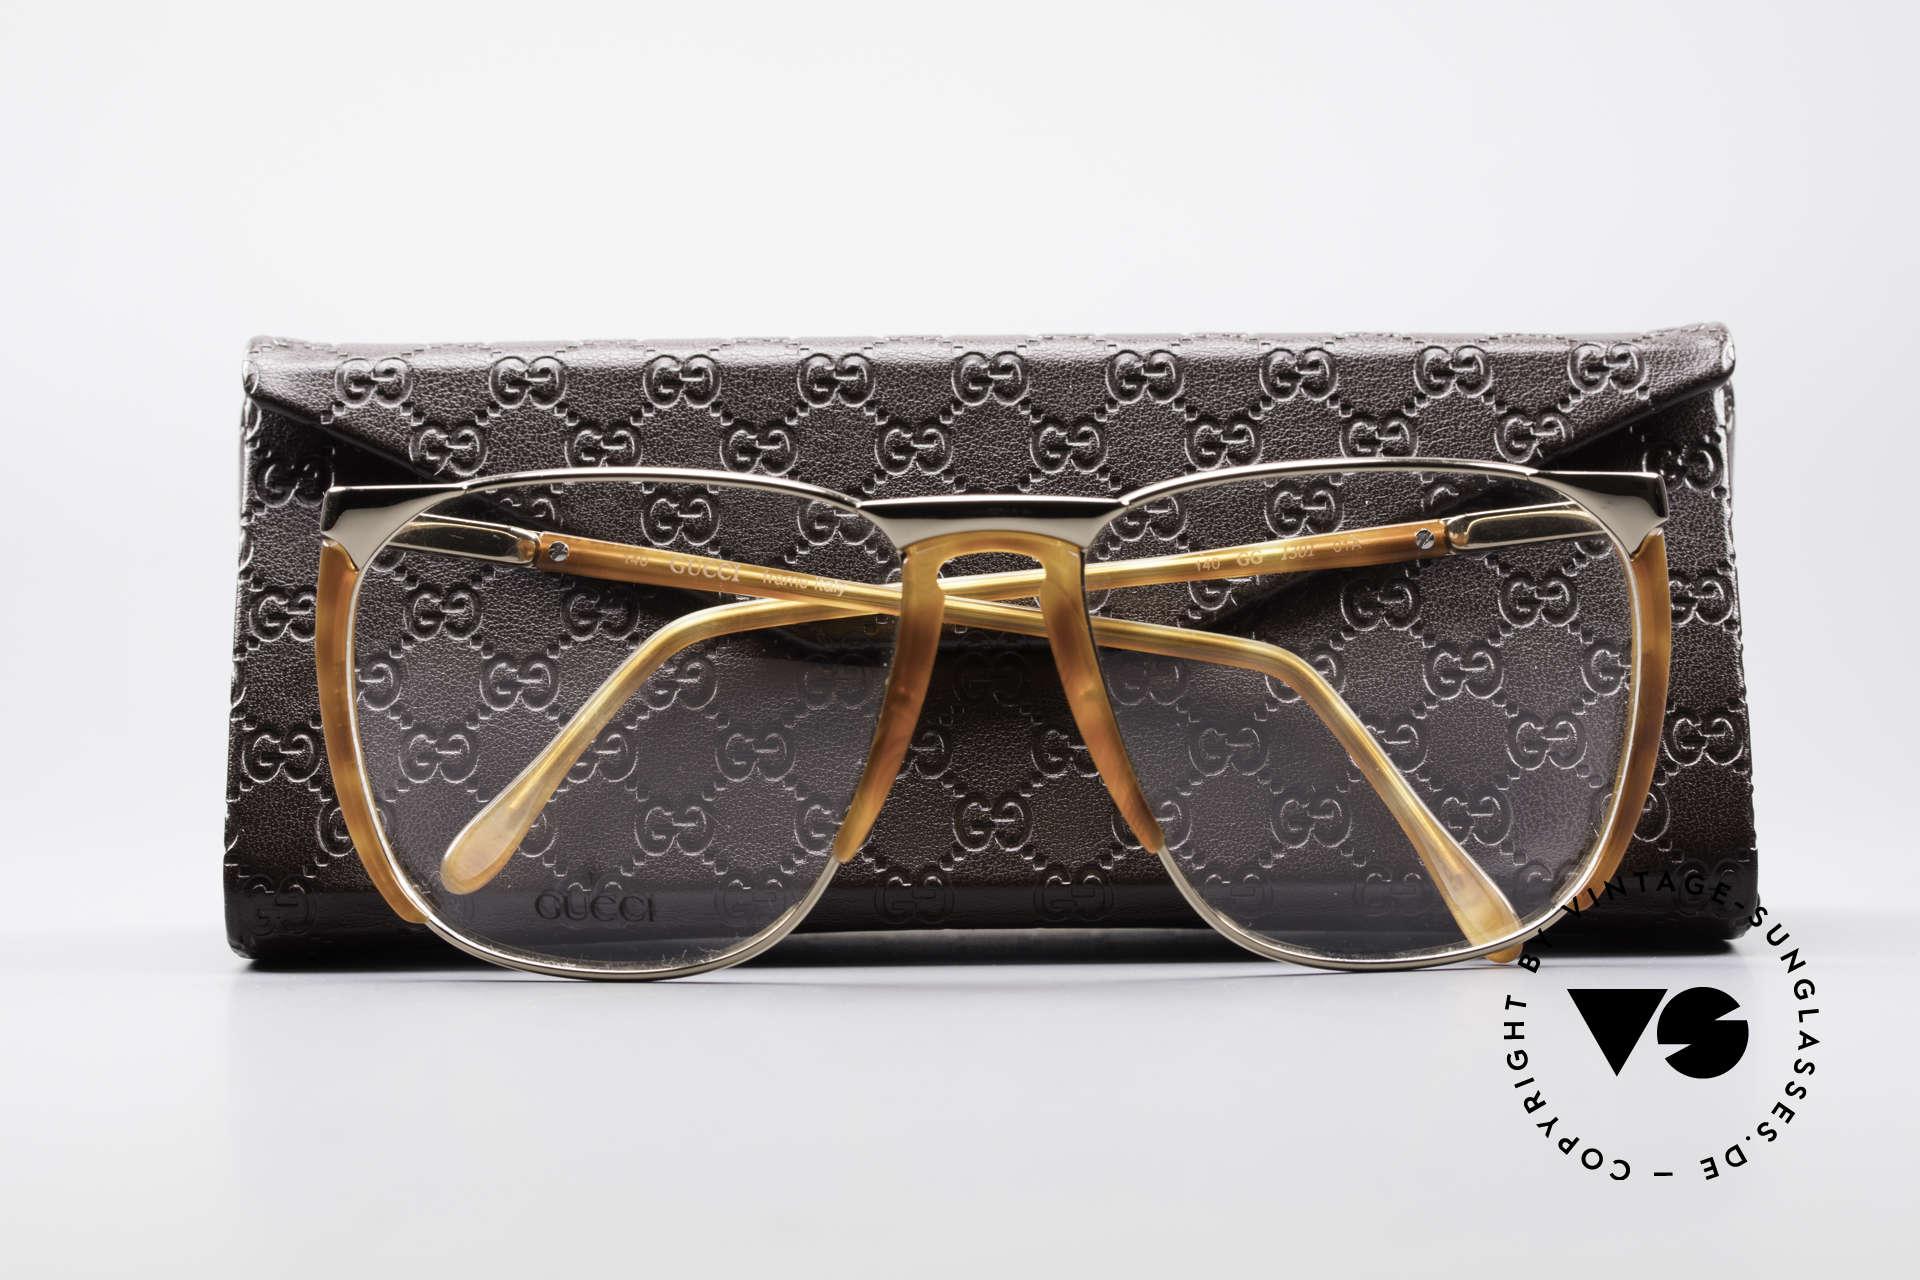 b1b7a21cc6 Glasses Gucci 1301 80 s Designer Eyeglasses